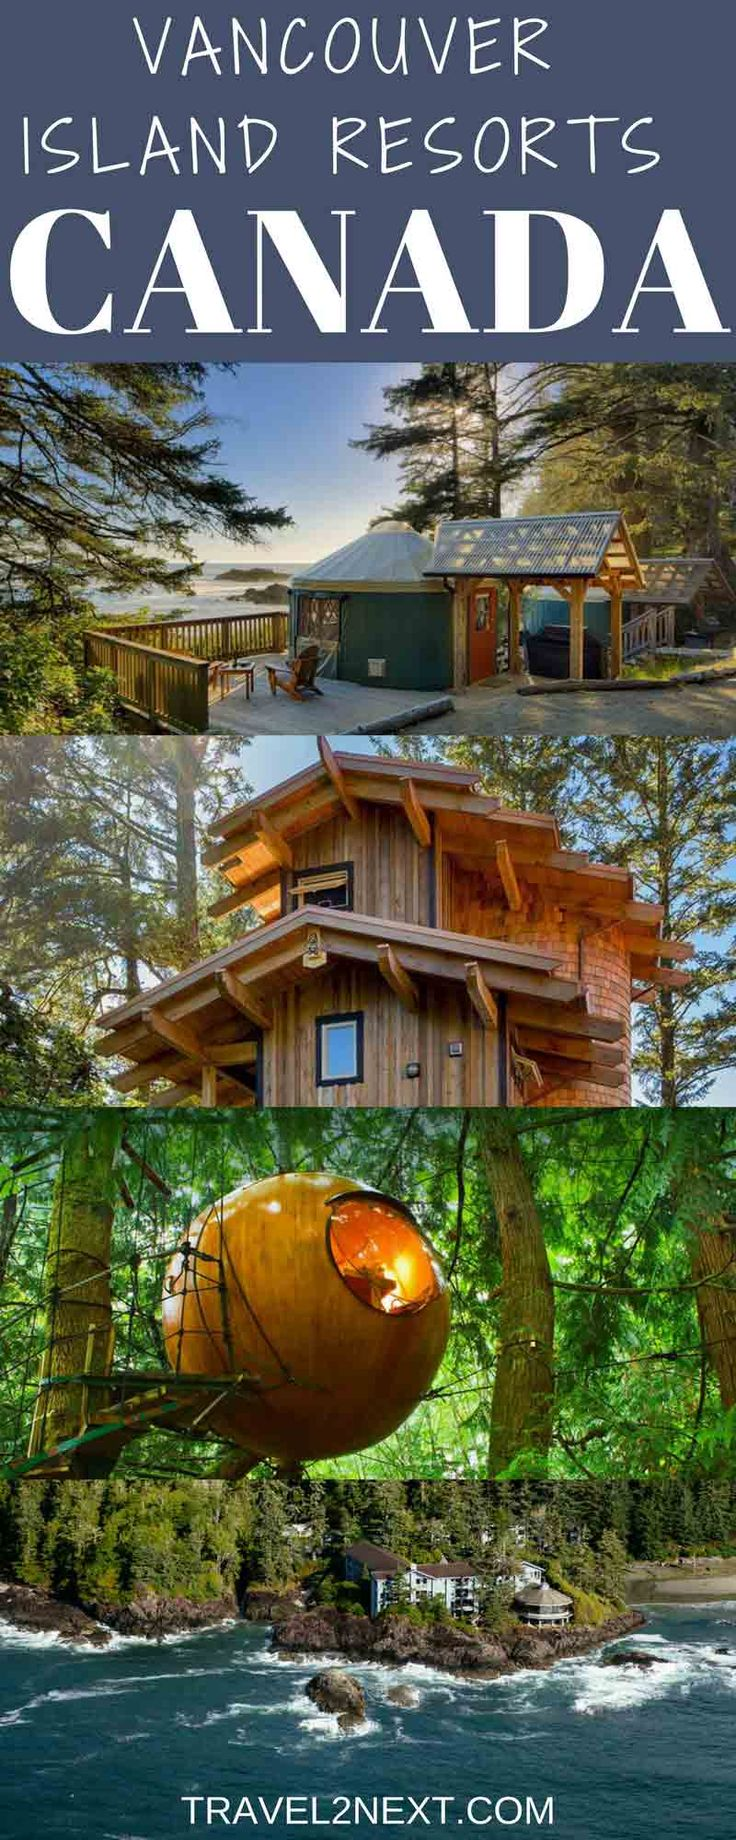 Vancouver Island Resorts